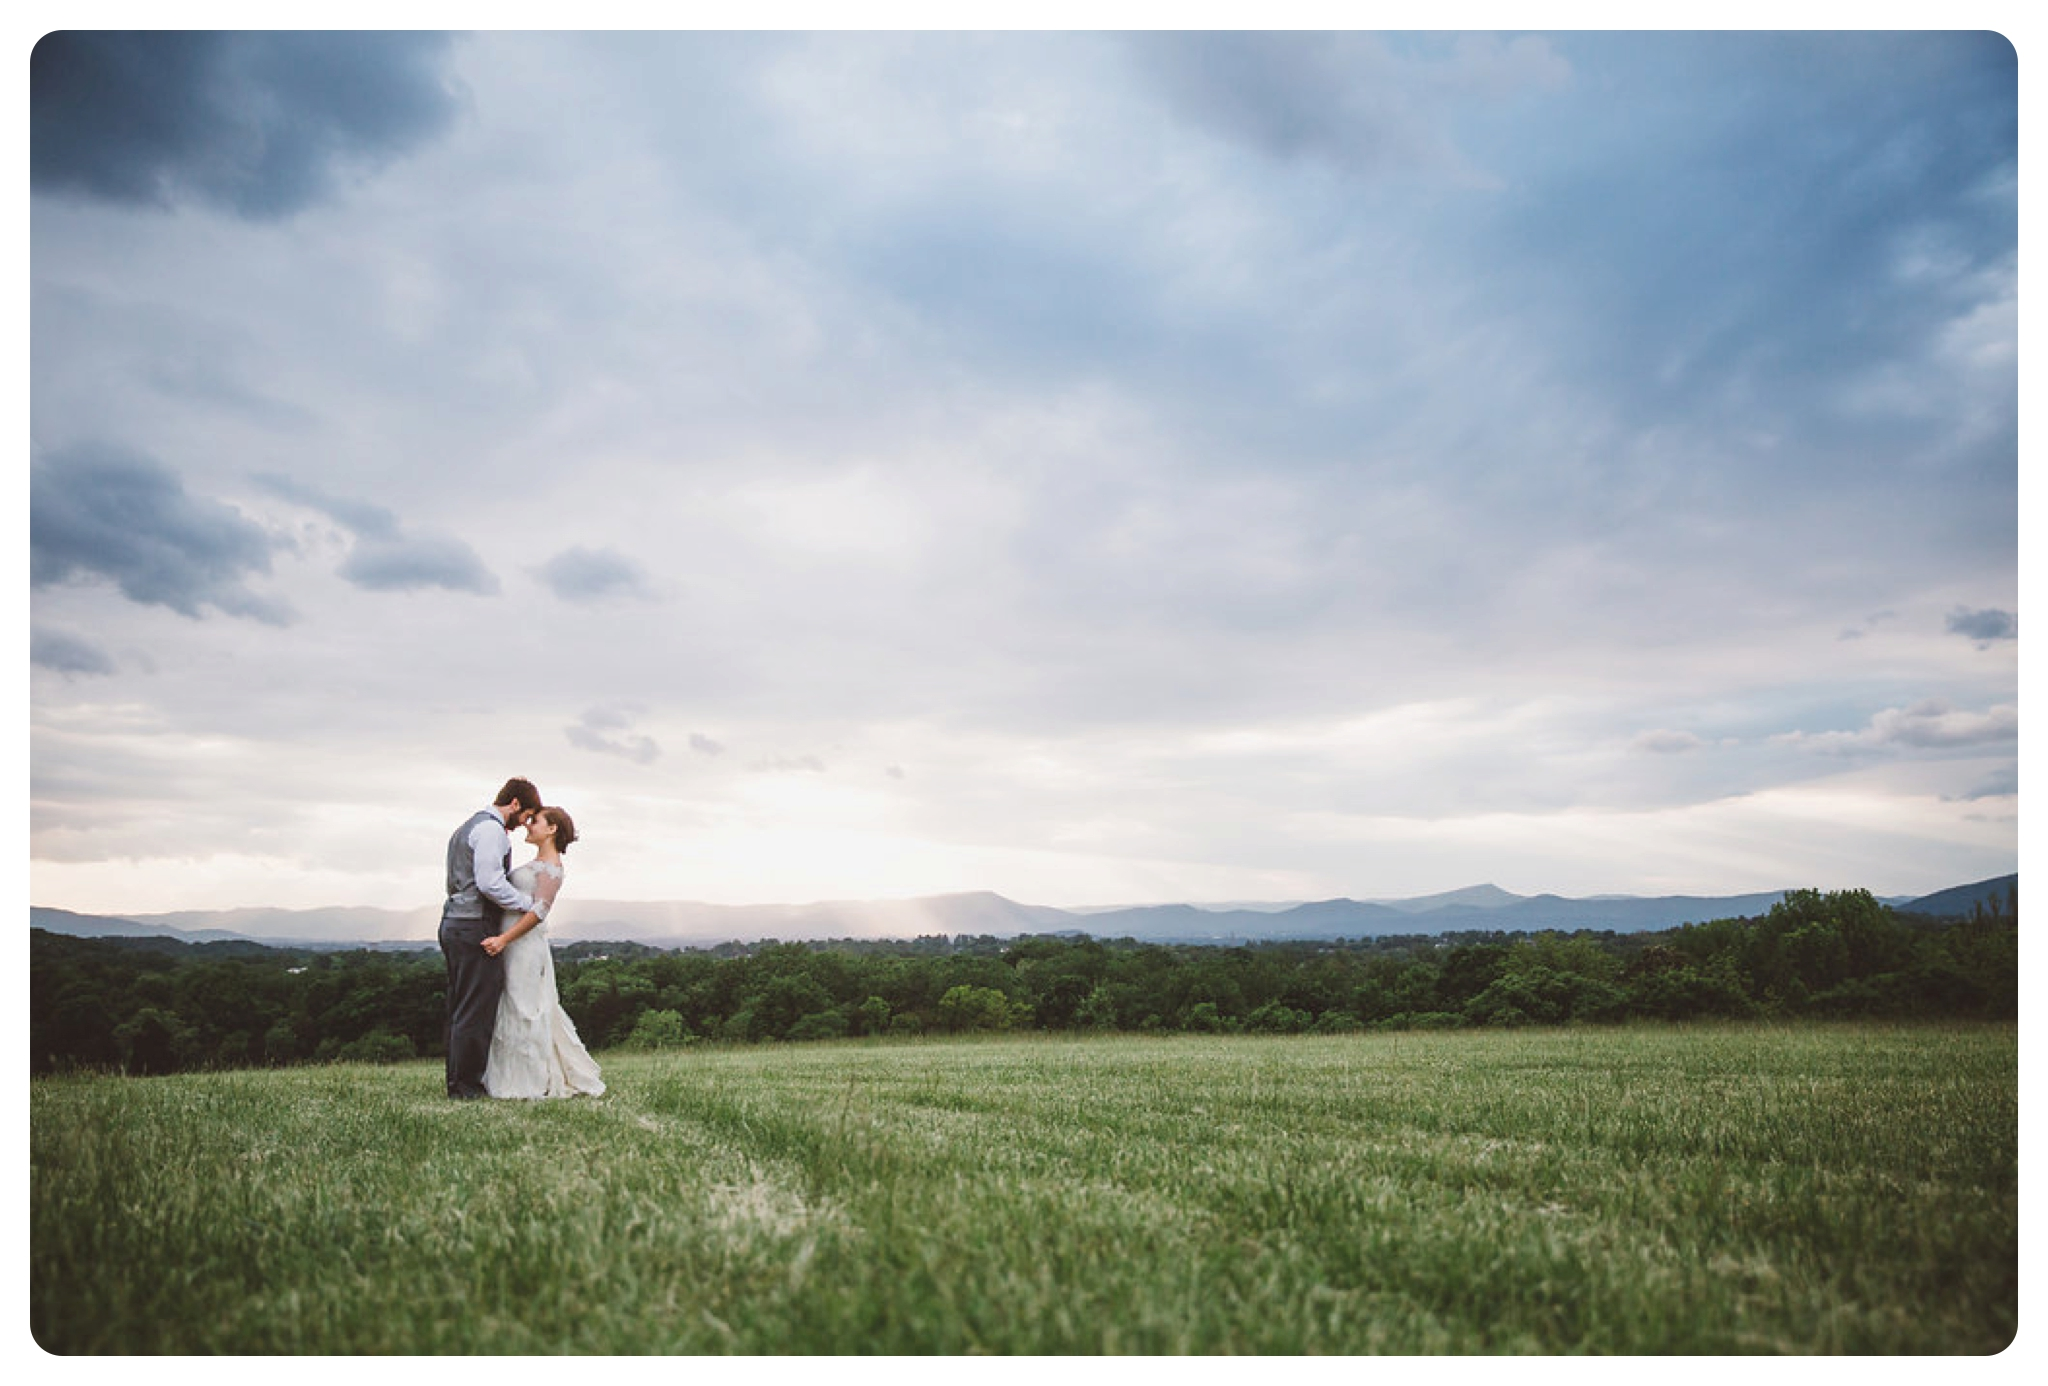 Braeloch-Weddings-Wedding-Photographer-Pat-Cori-Photography-032.jpg